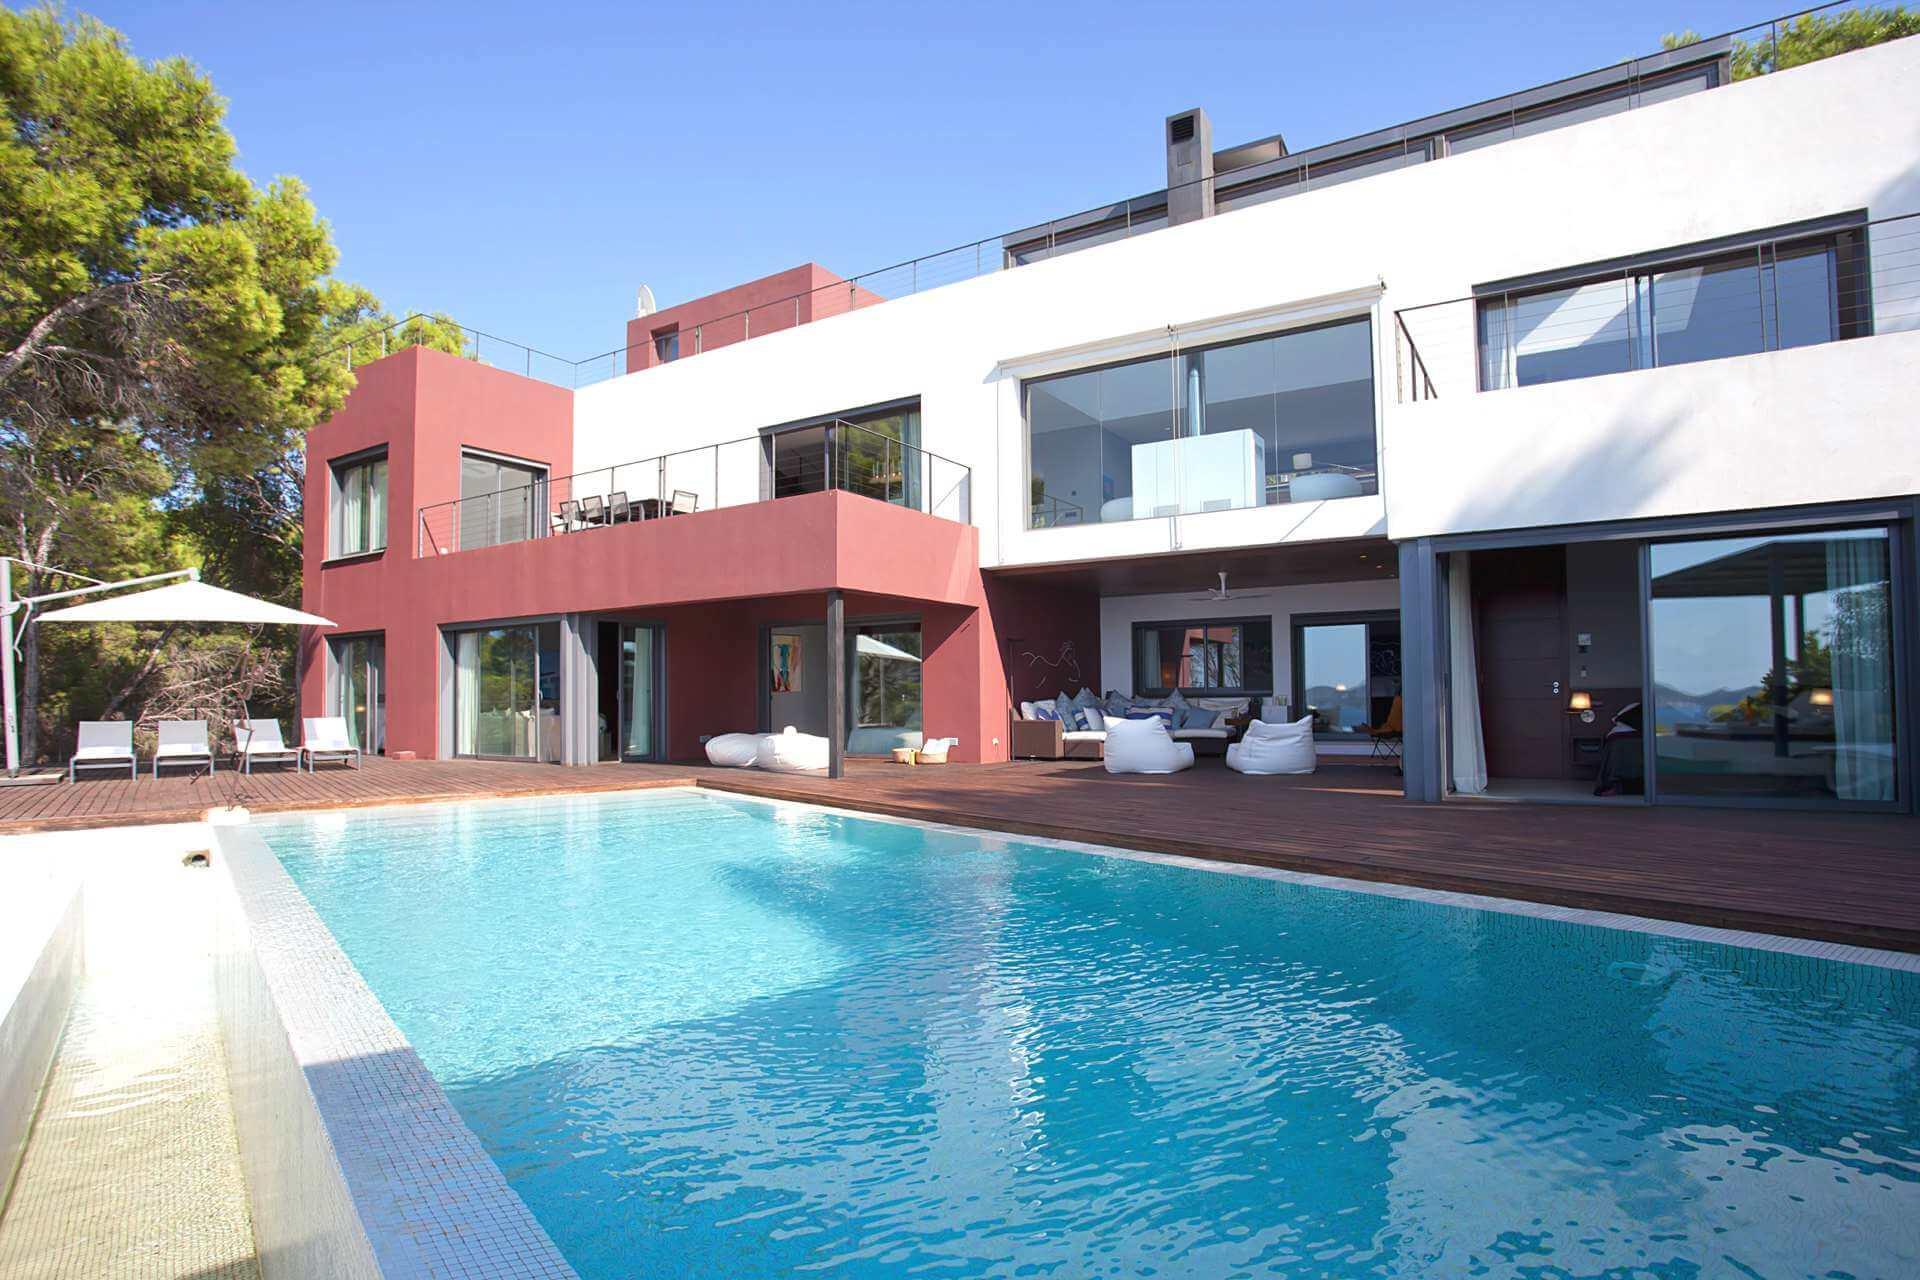 01-332 Meerblick Villa Mallorca Südwesten Bild 7